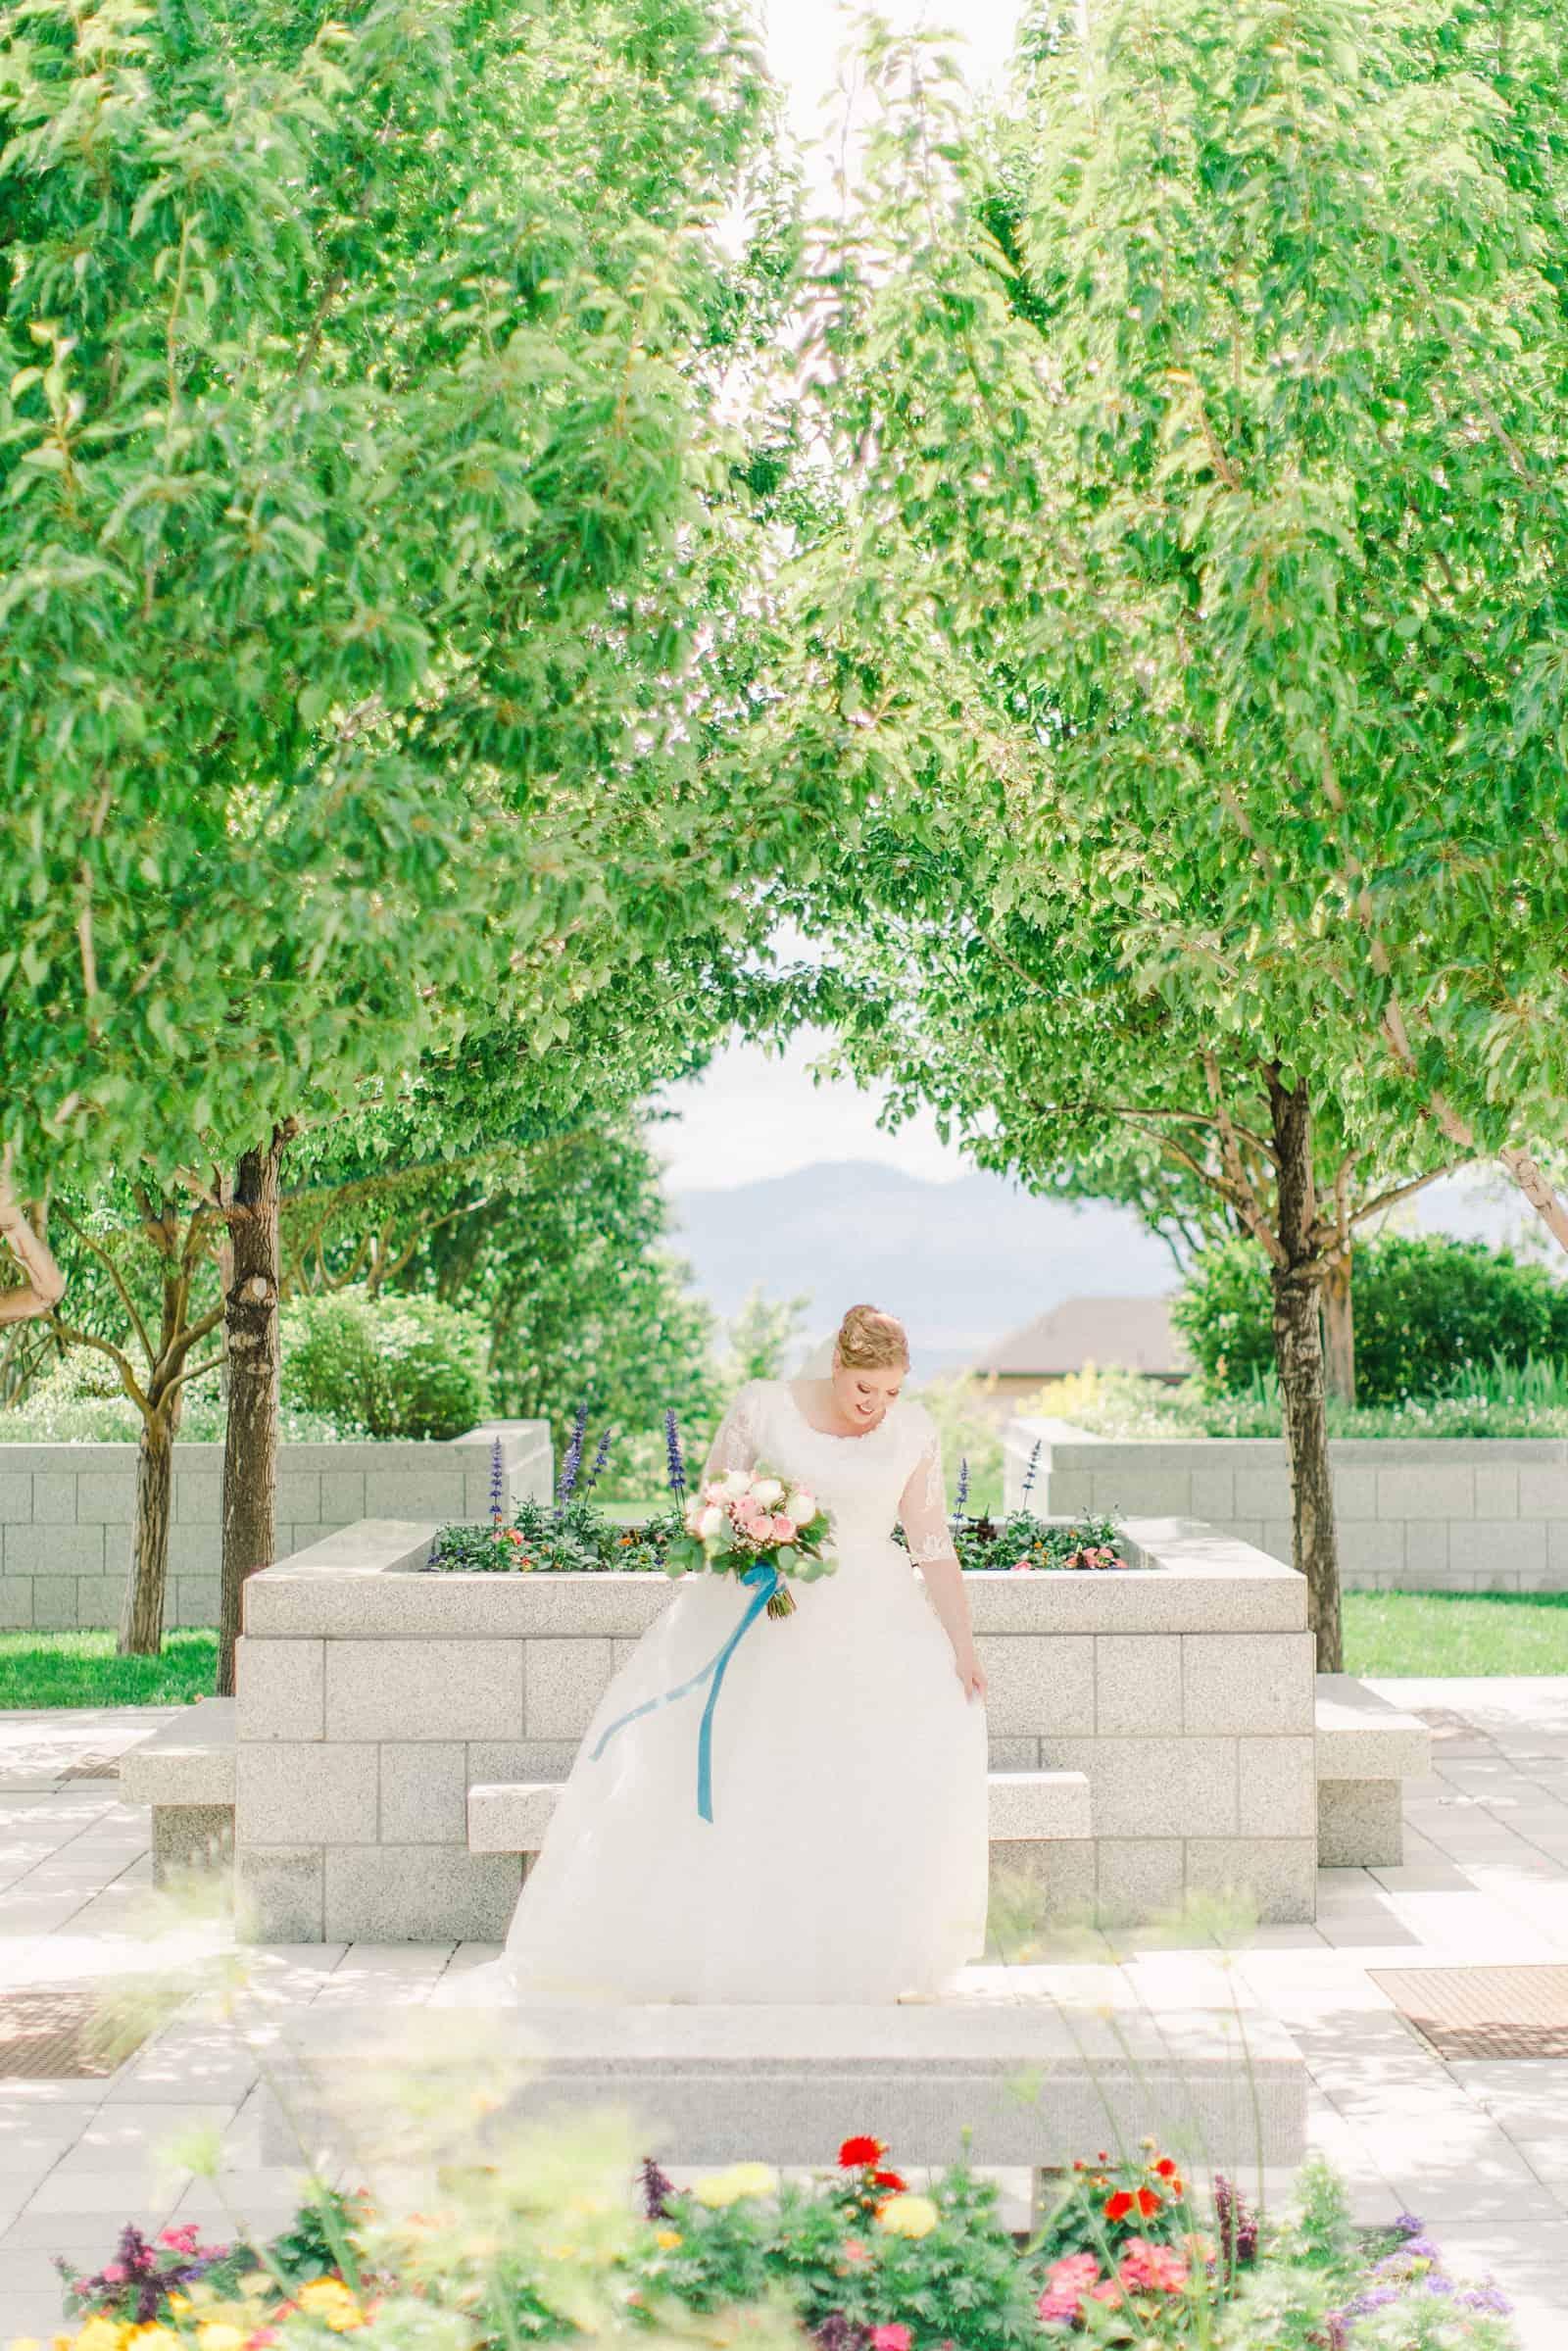 Draper LDS Temple Wedding, Utah wedding photography, summer backyard wedding, modest lace wedding dress with long train